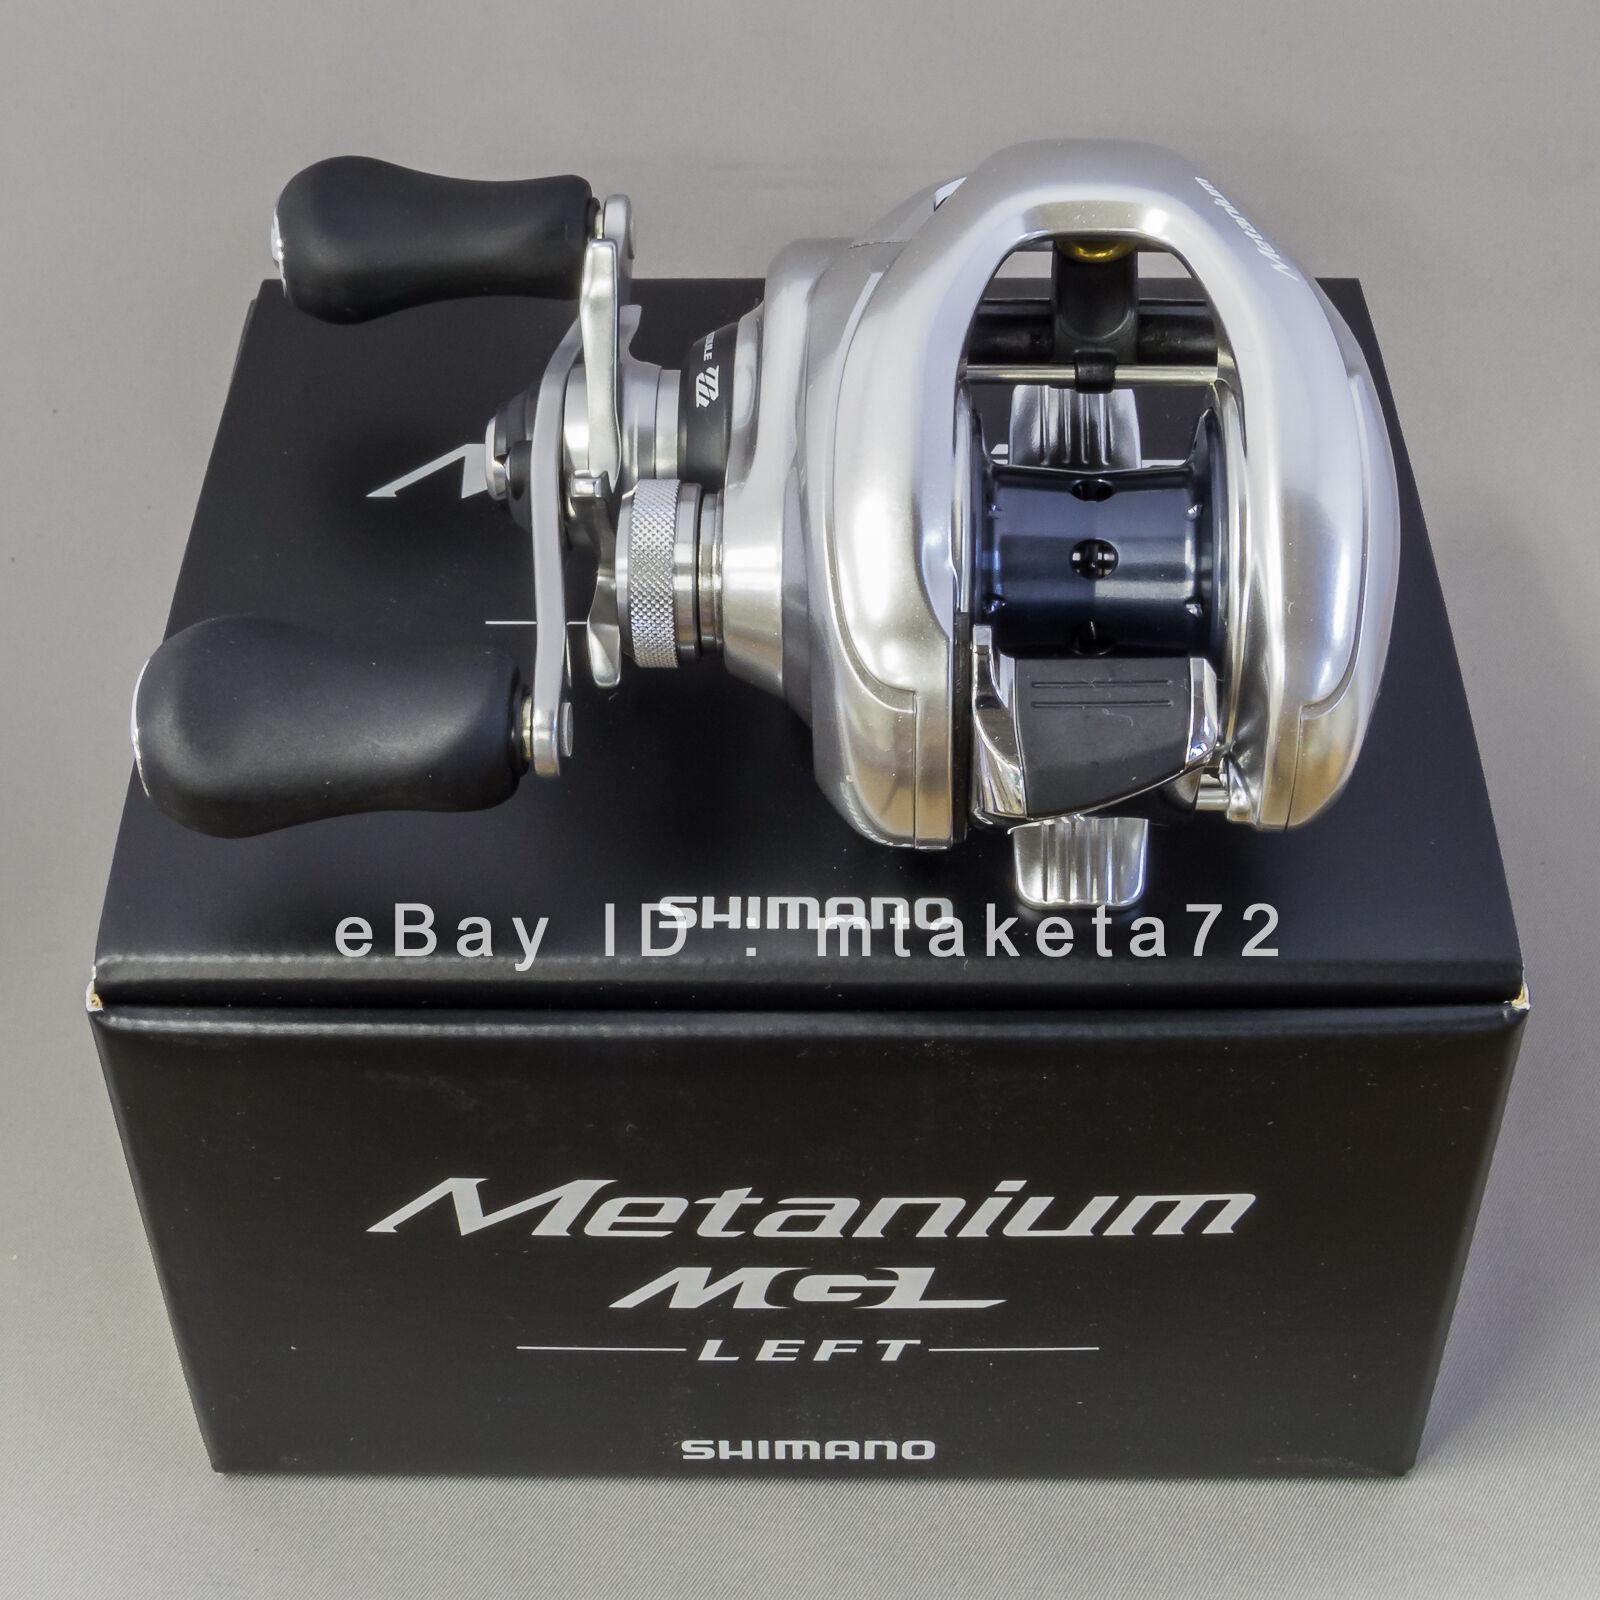 Shimano 16 Metanium MGL, Gear Ratio 6.2 1, Left Handle, Japan Model, 035318